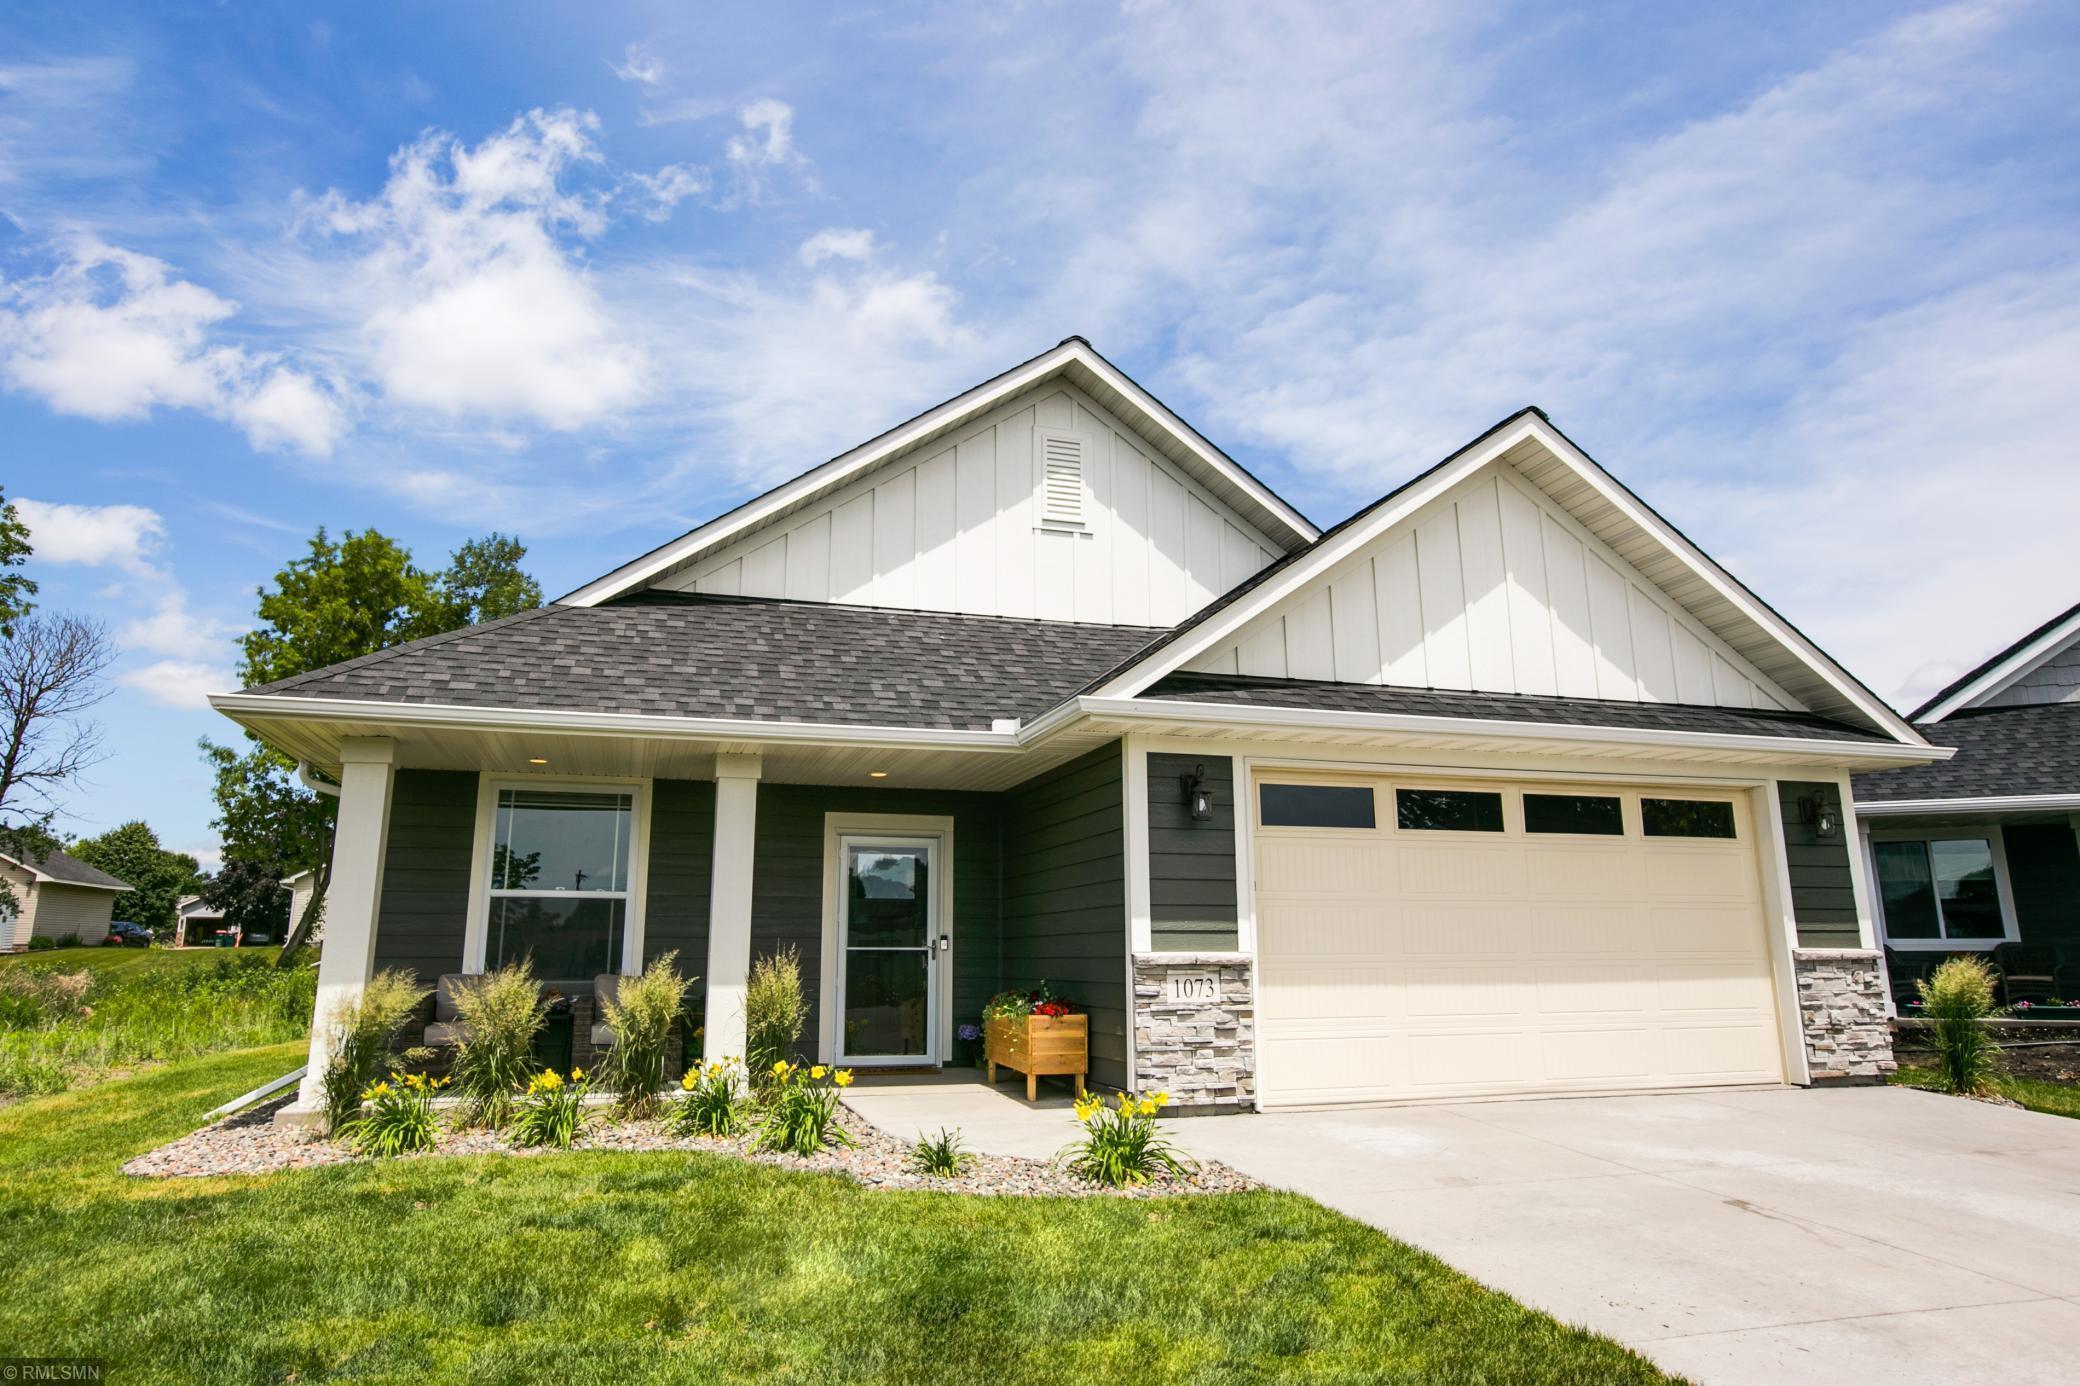 1073 109th Court NE Property Photo - Blaine, MN real estate listing